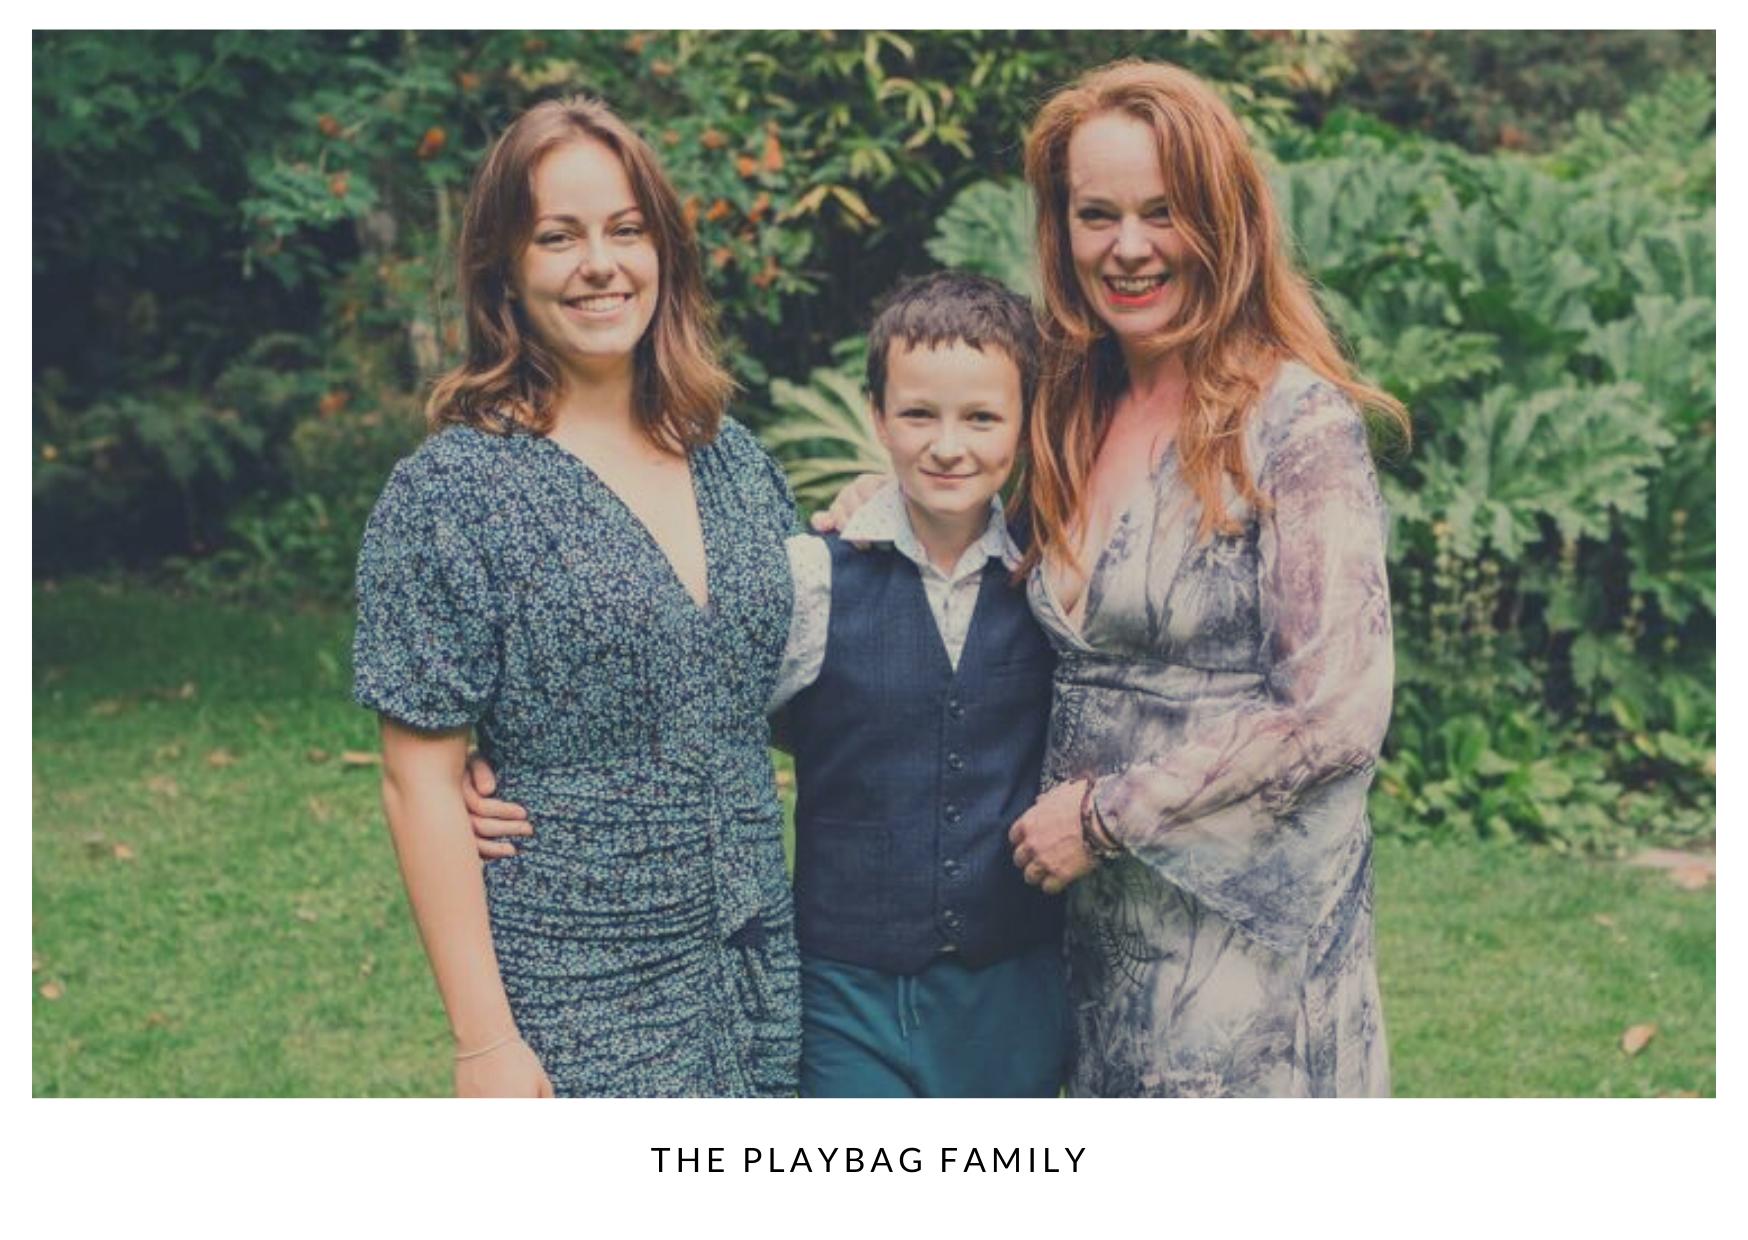 PlayBag Family